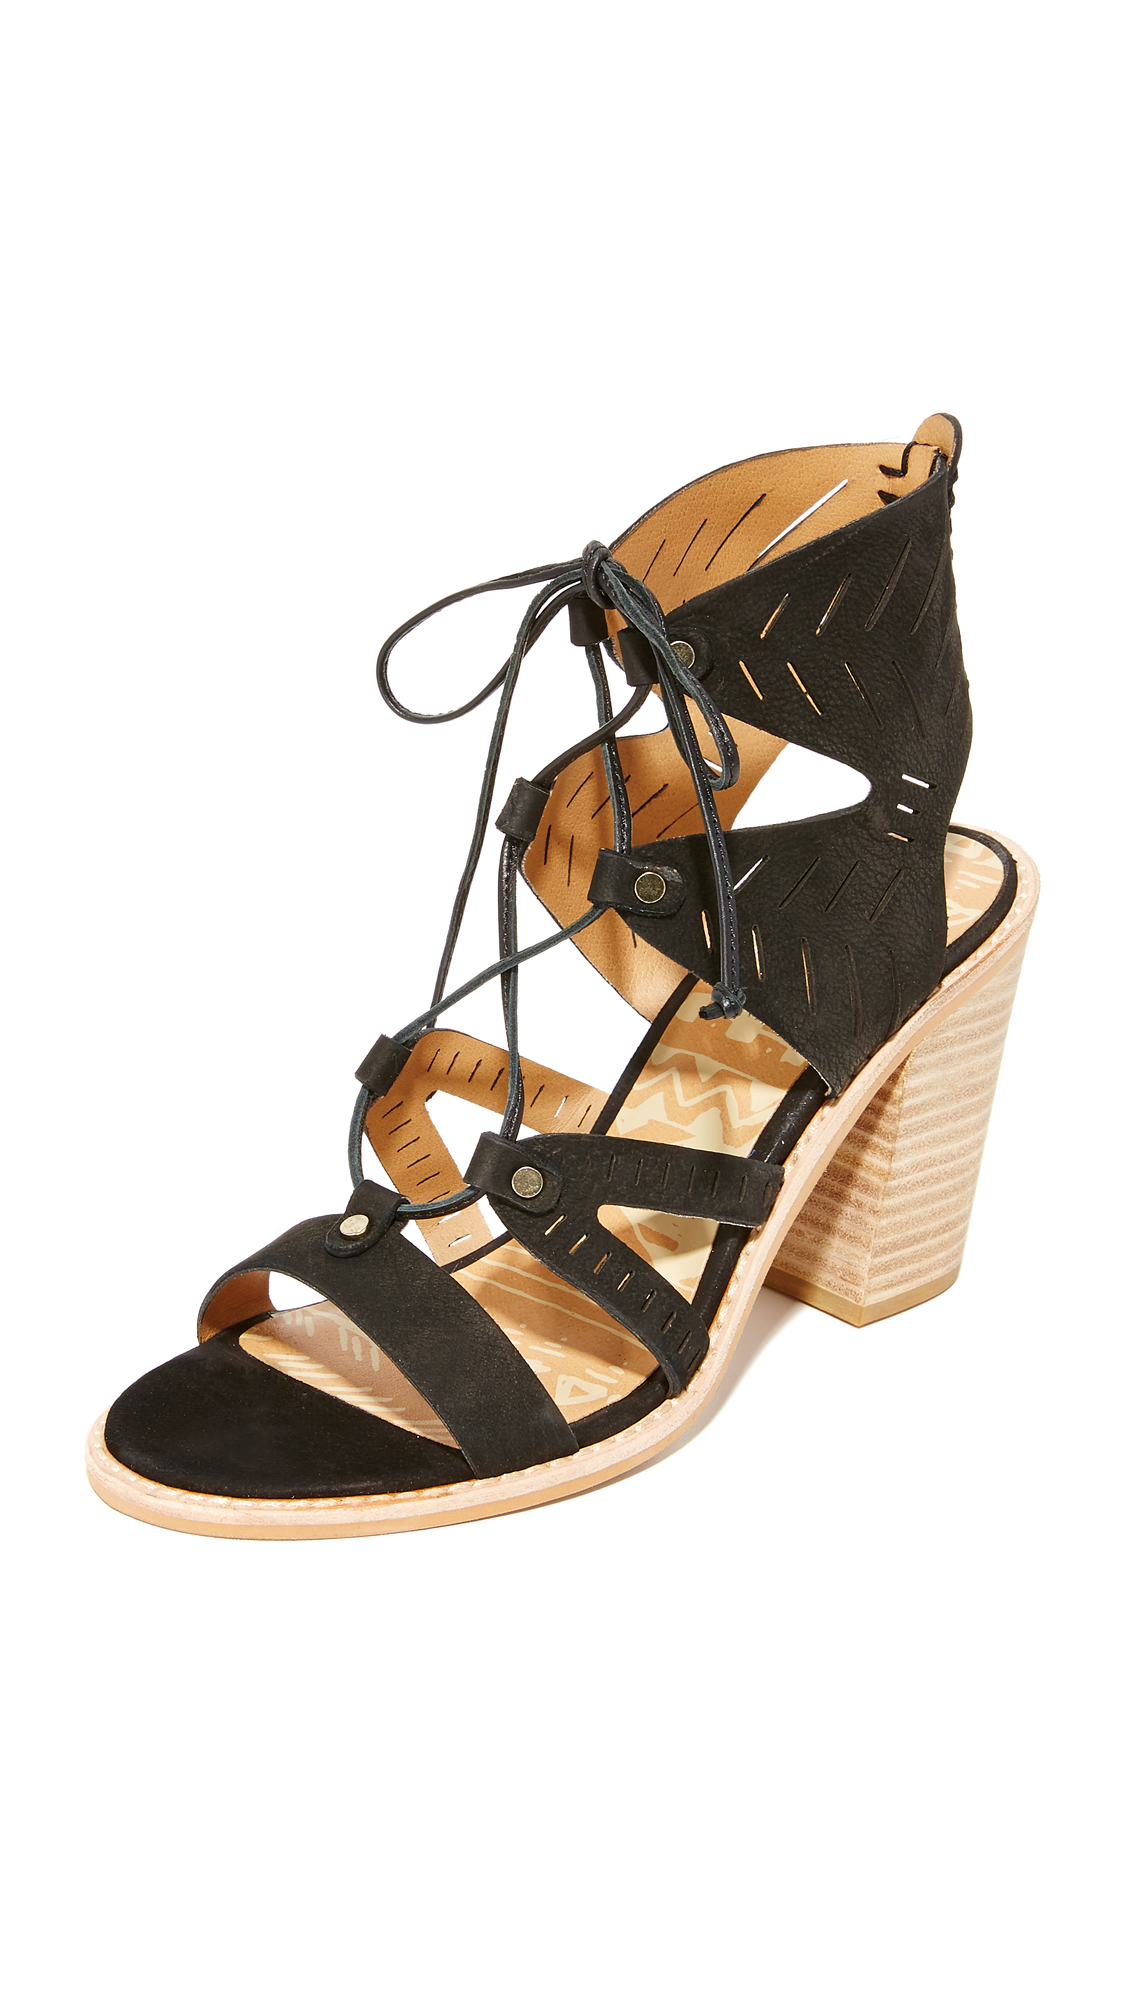 Dolce Vita Luci Sandals - Black at Shopbop